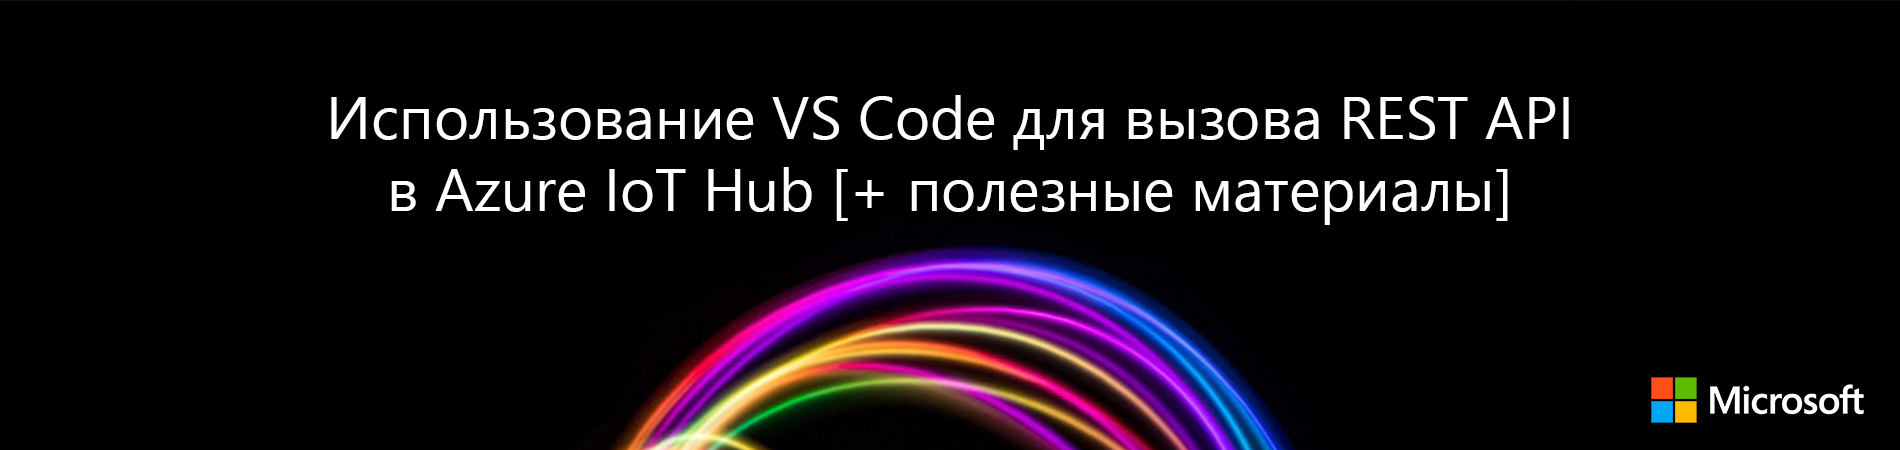 Using VS Code to call the REST API in Azure IoT Hub[+ полезные материалы]